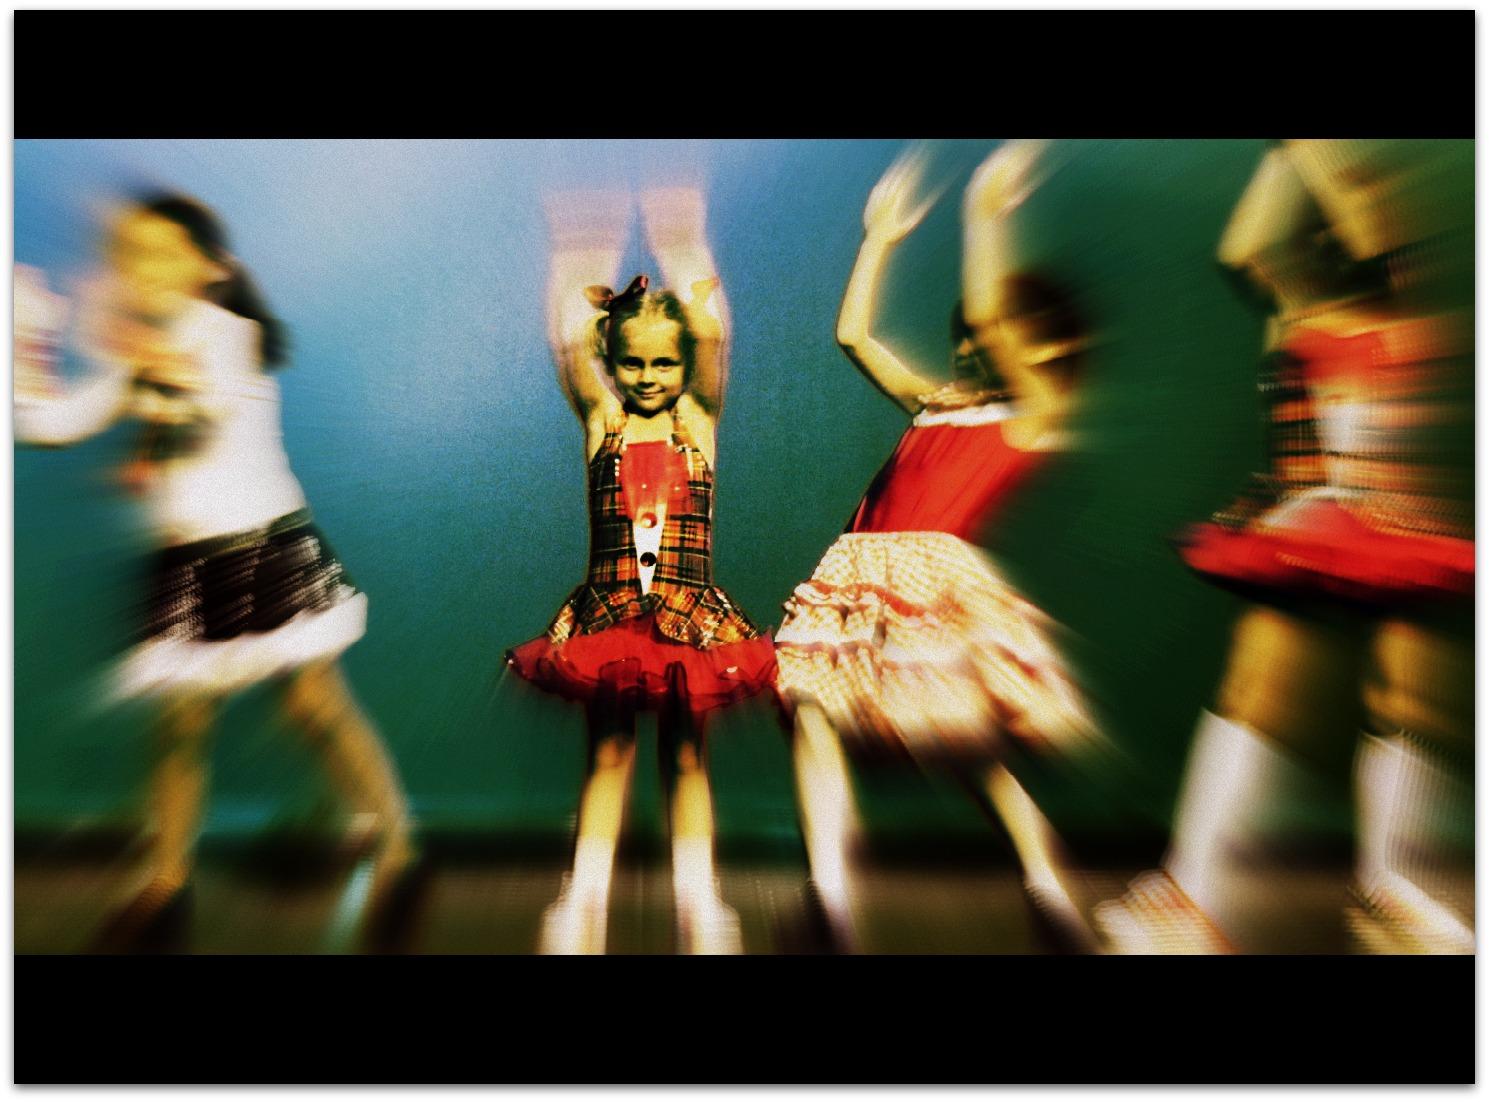 Motion Dance Dance Motion